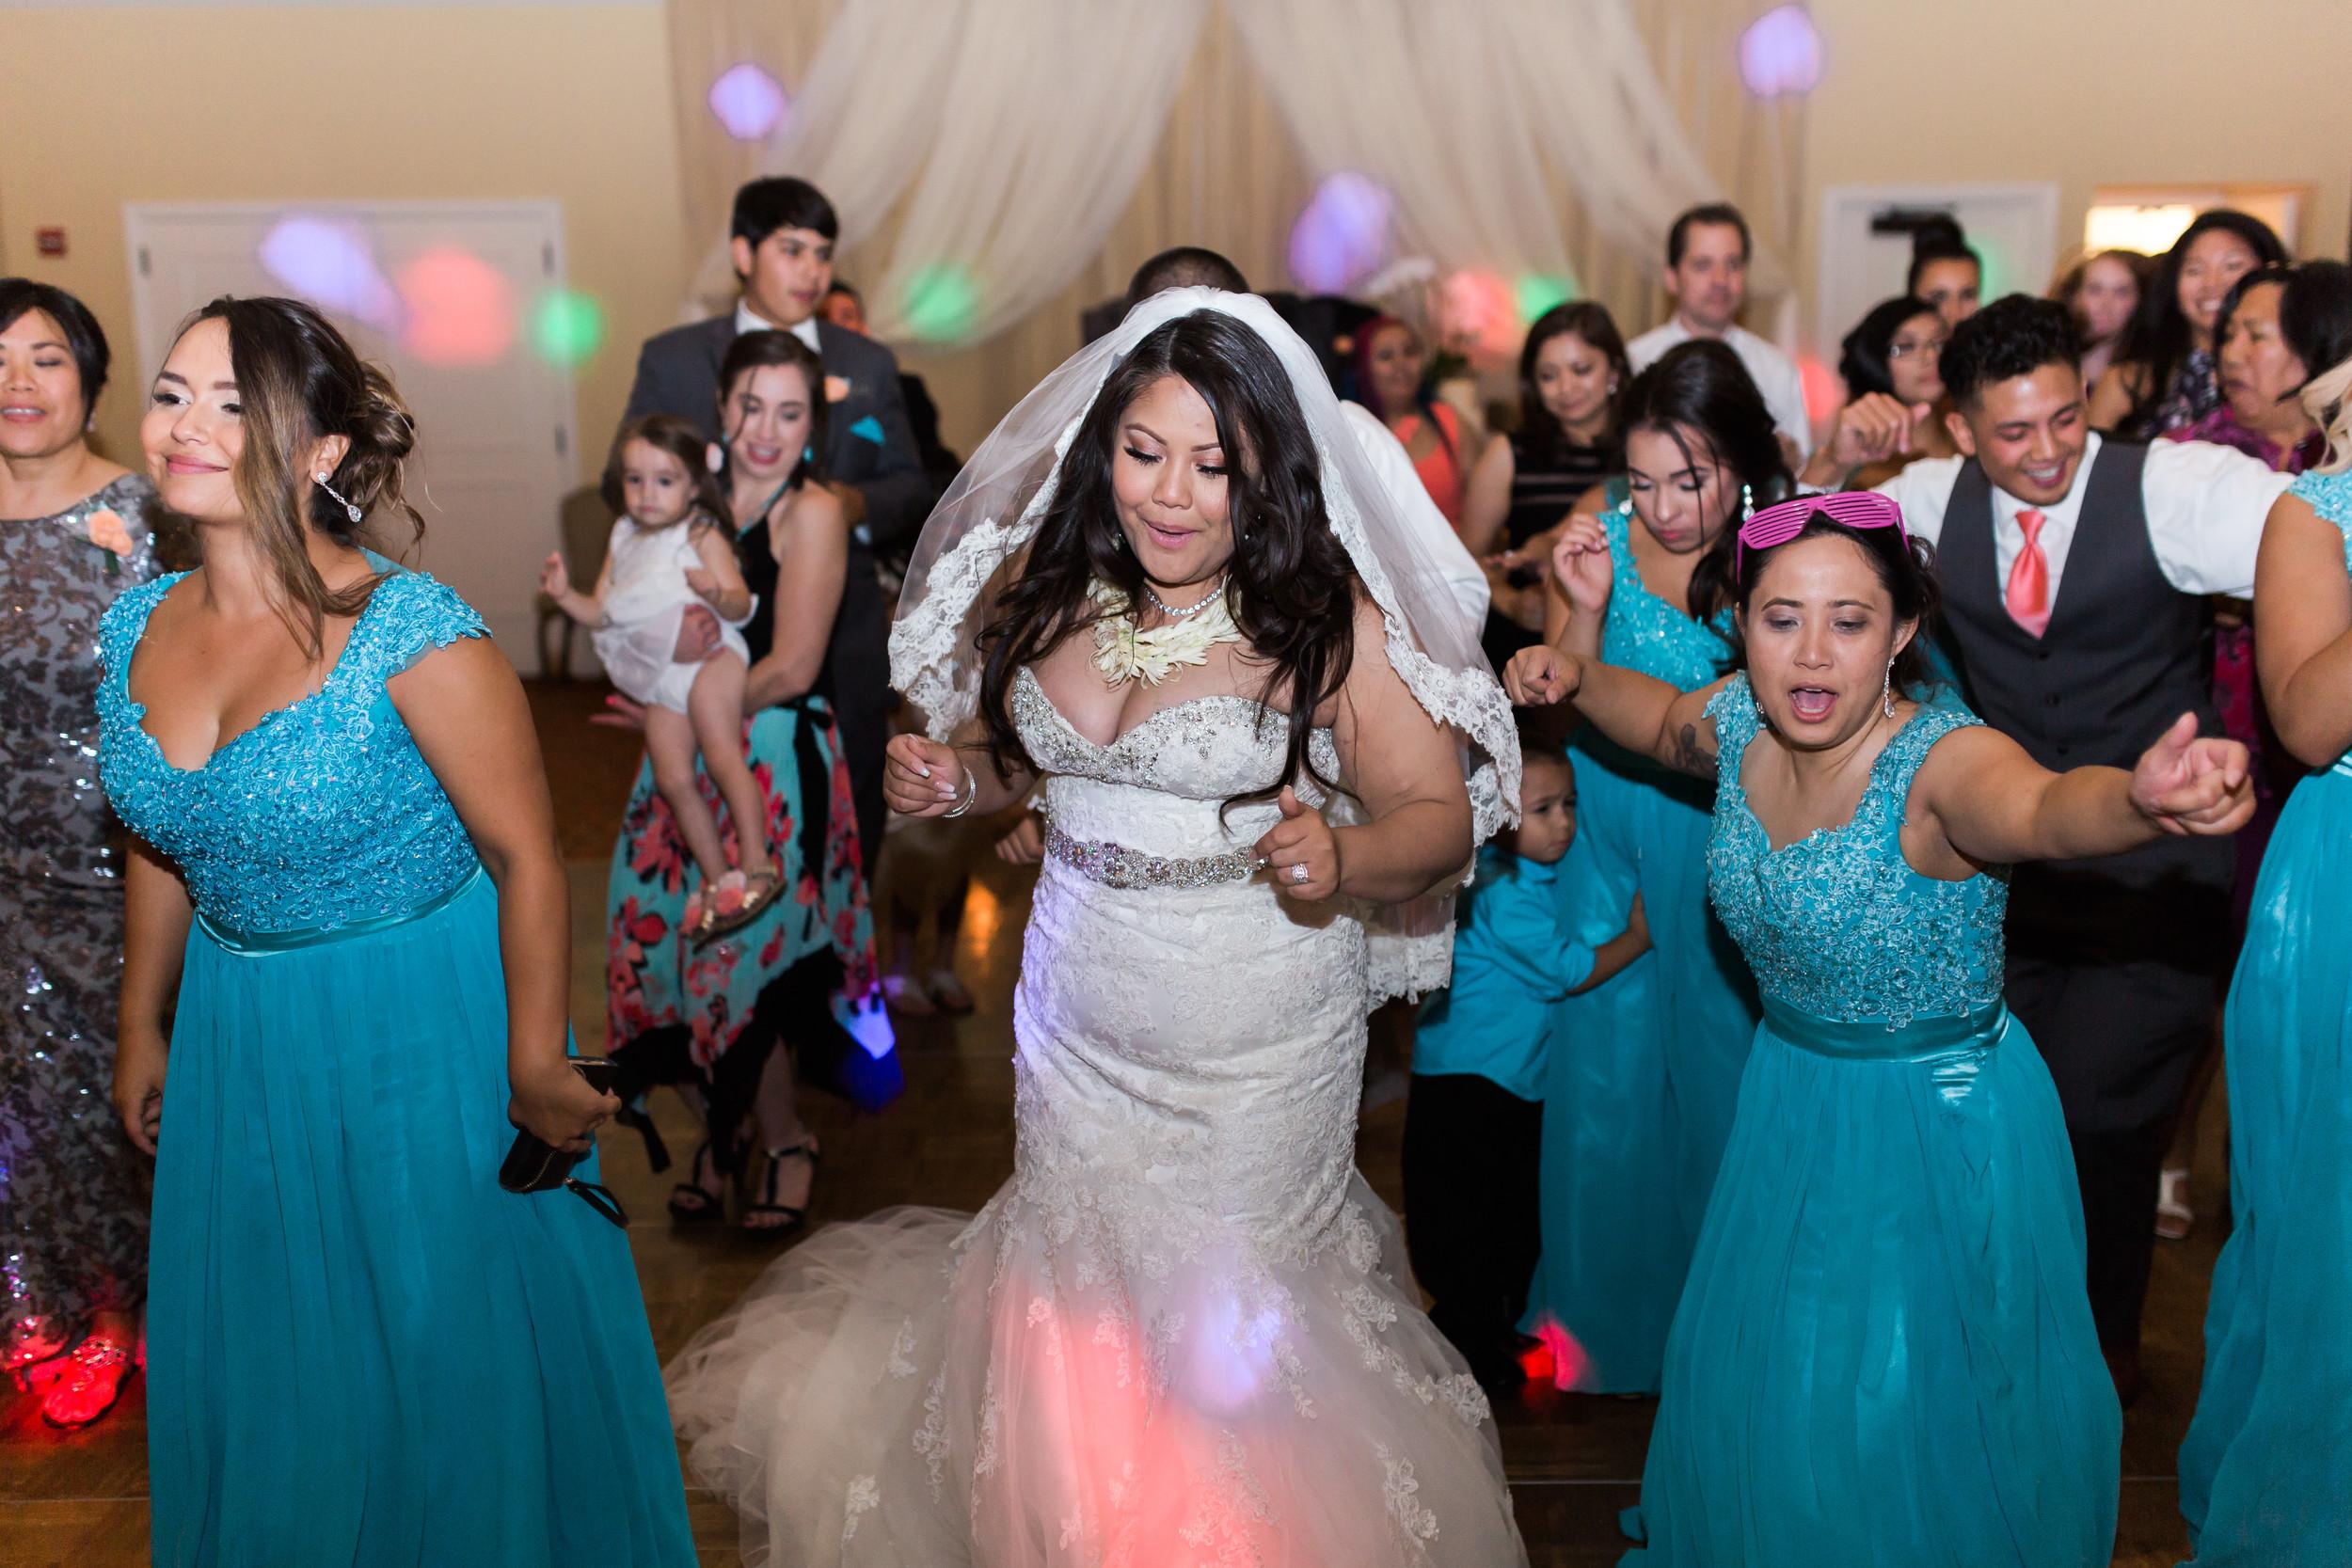 hawaiian-inspired-wedding-at-blackhawk-country-club-3762.jpg